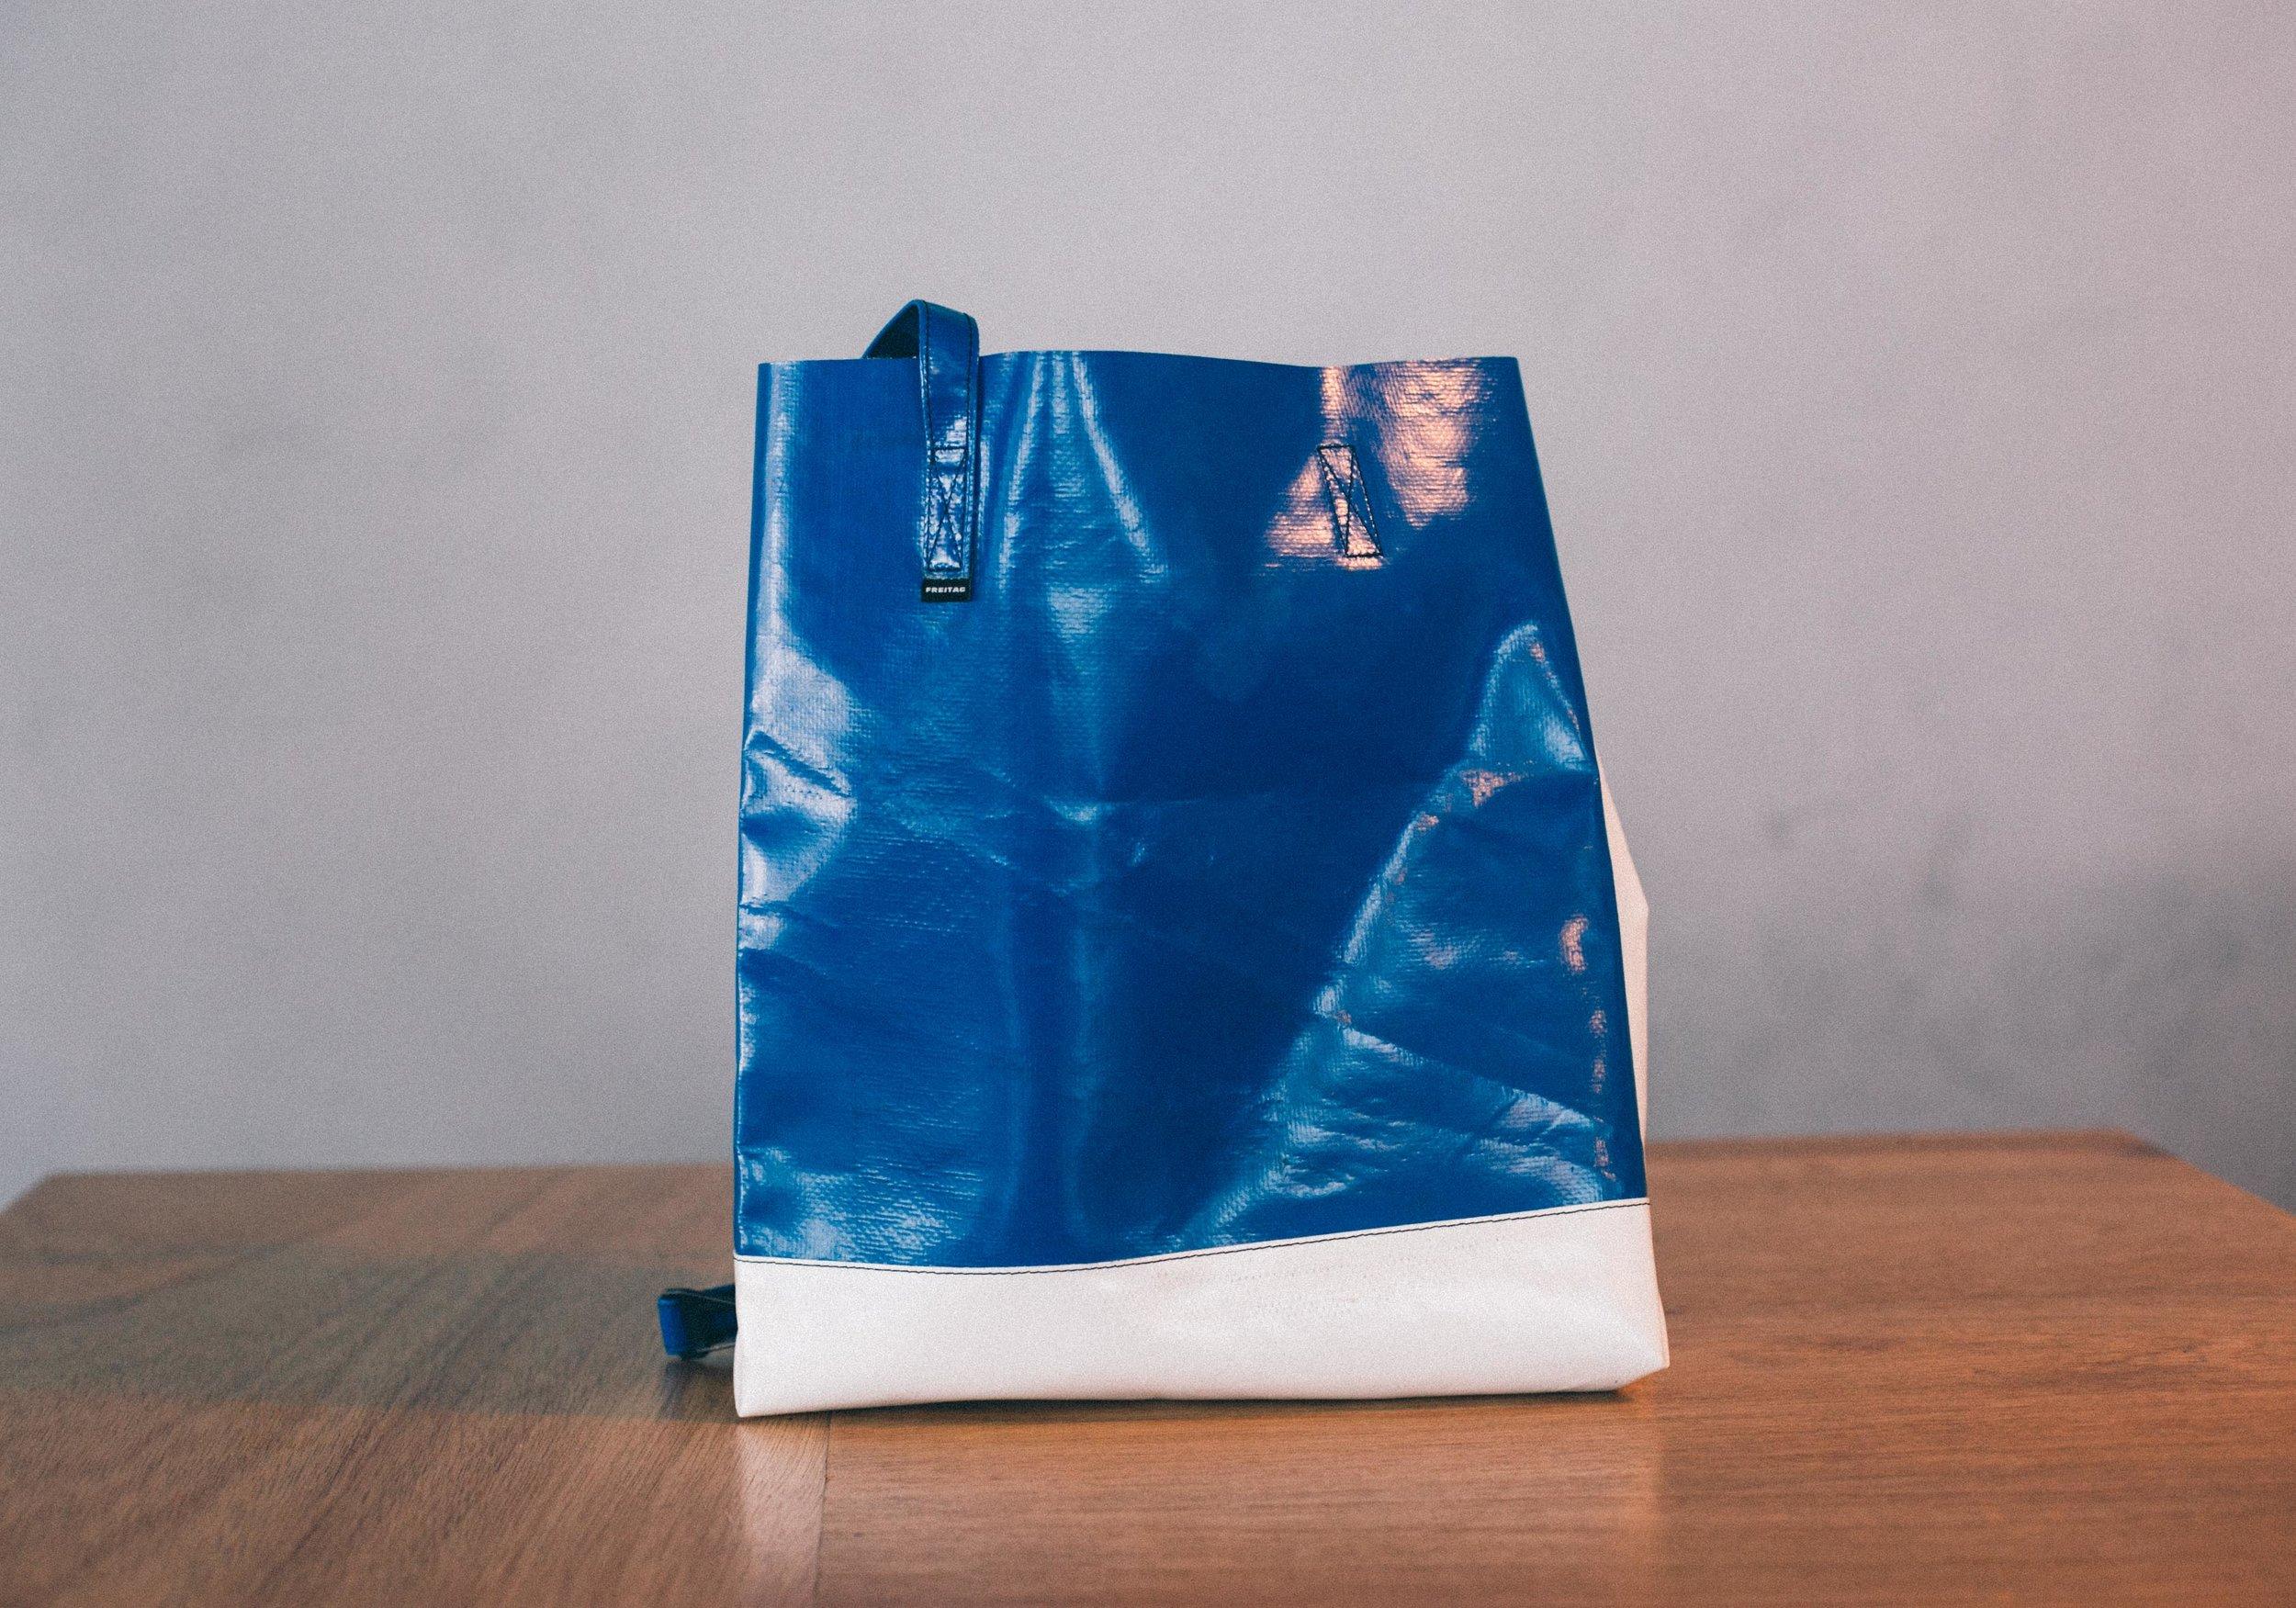 Freitag Bag from joana